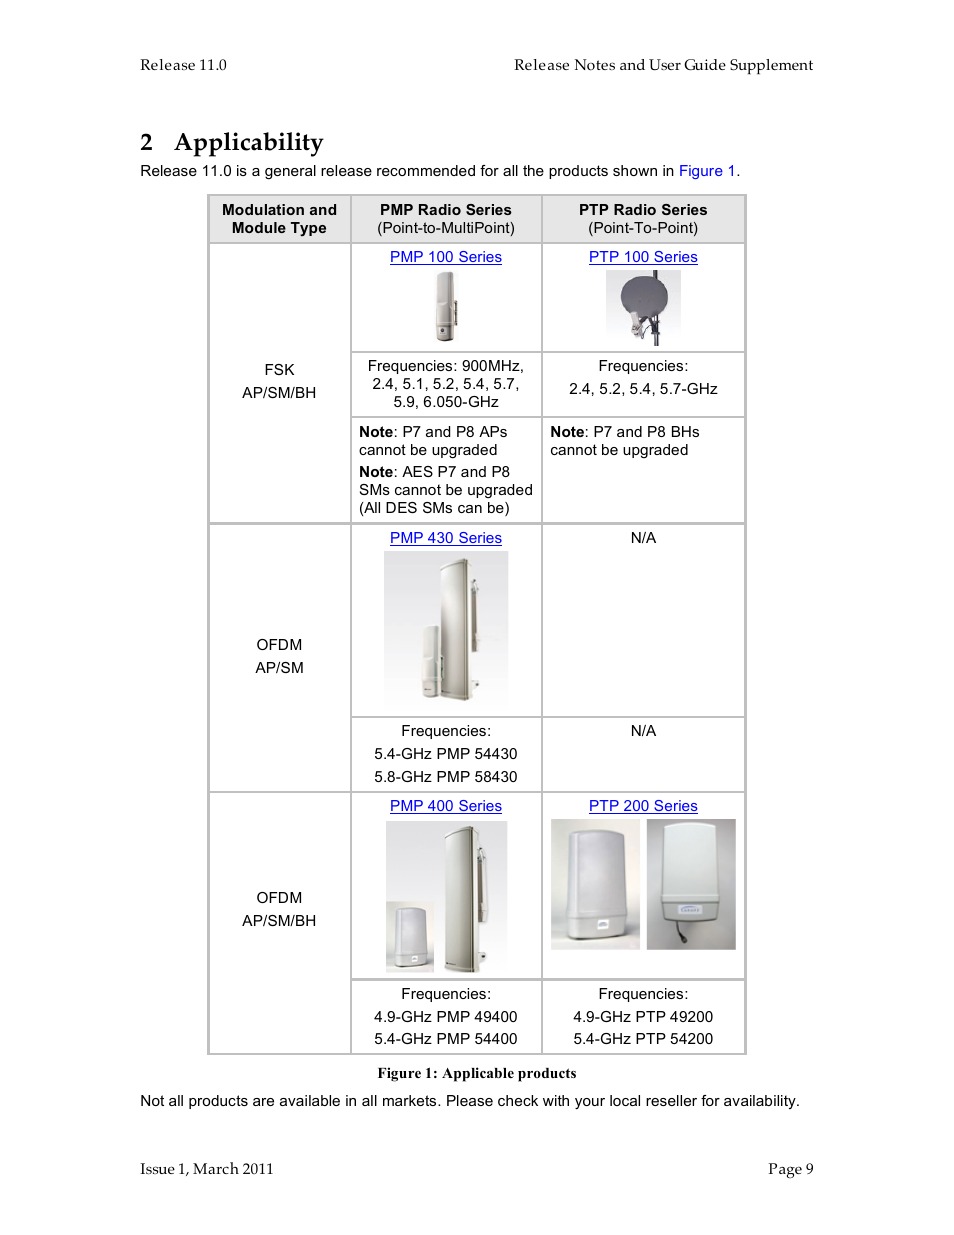 2 applicability | Motorola Canopy FSK and OFDM radios PTP 100 (FSK) User Manual  sc 1 st  manualsdir.com & 2 applicability | Motorola Canopy FSK and OFDM radios PTP 100 (FSK ...